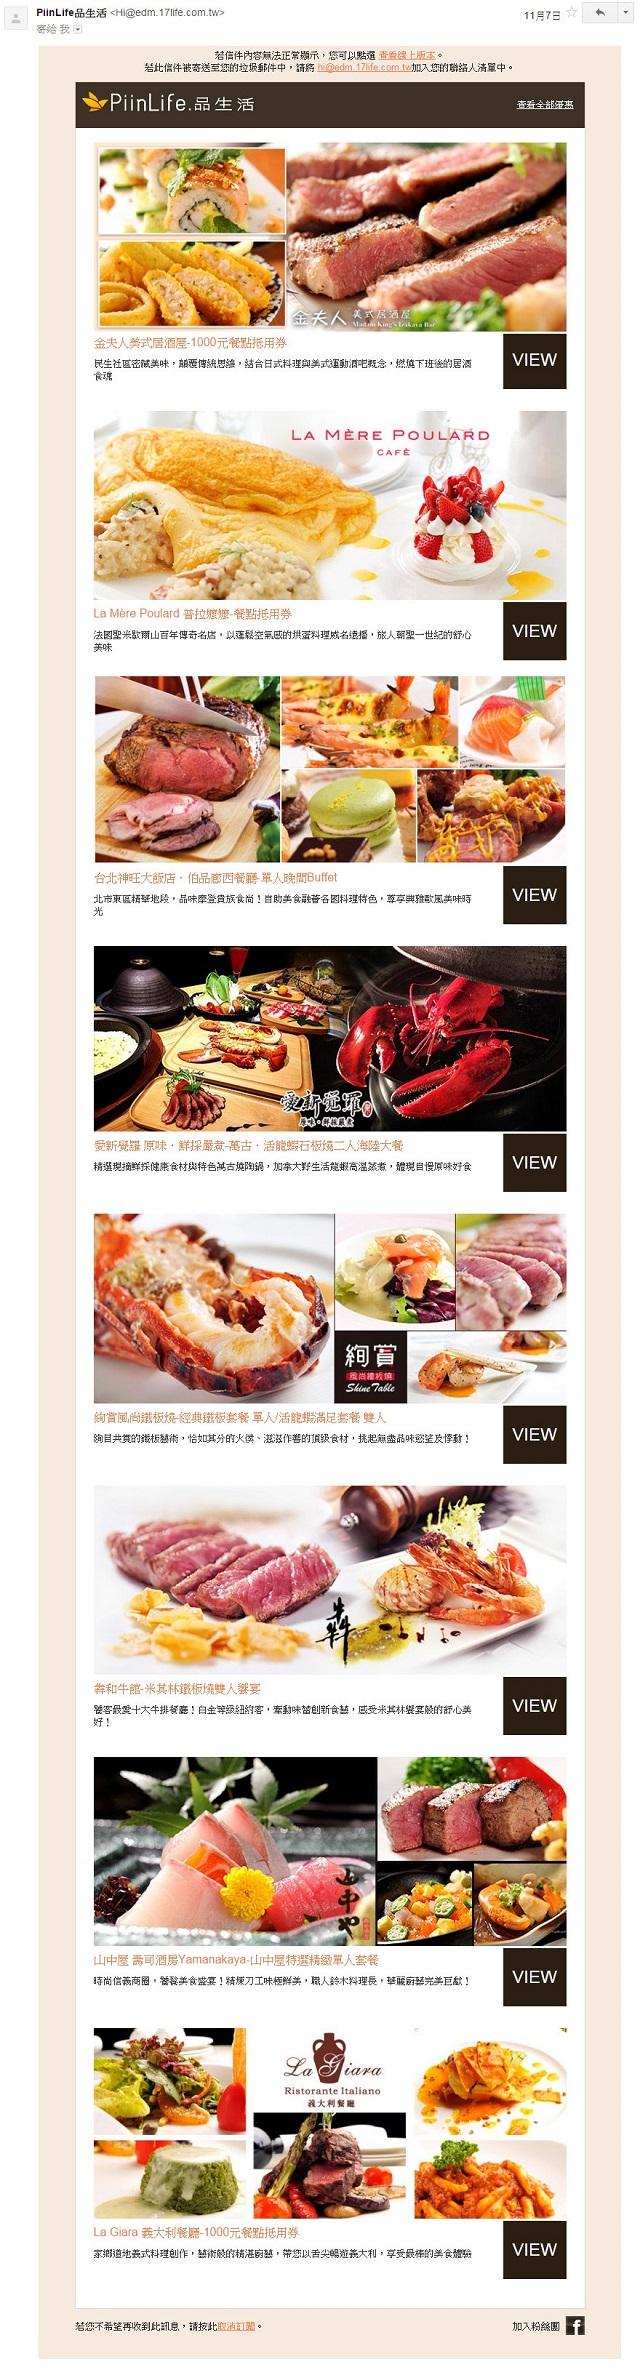 piin_life_promotion_640